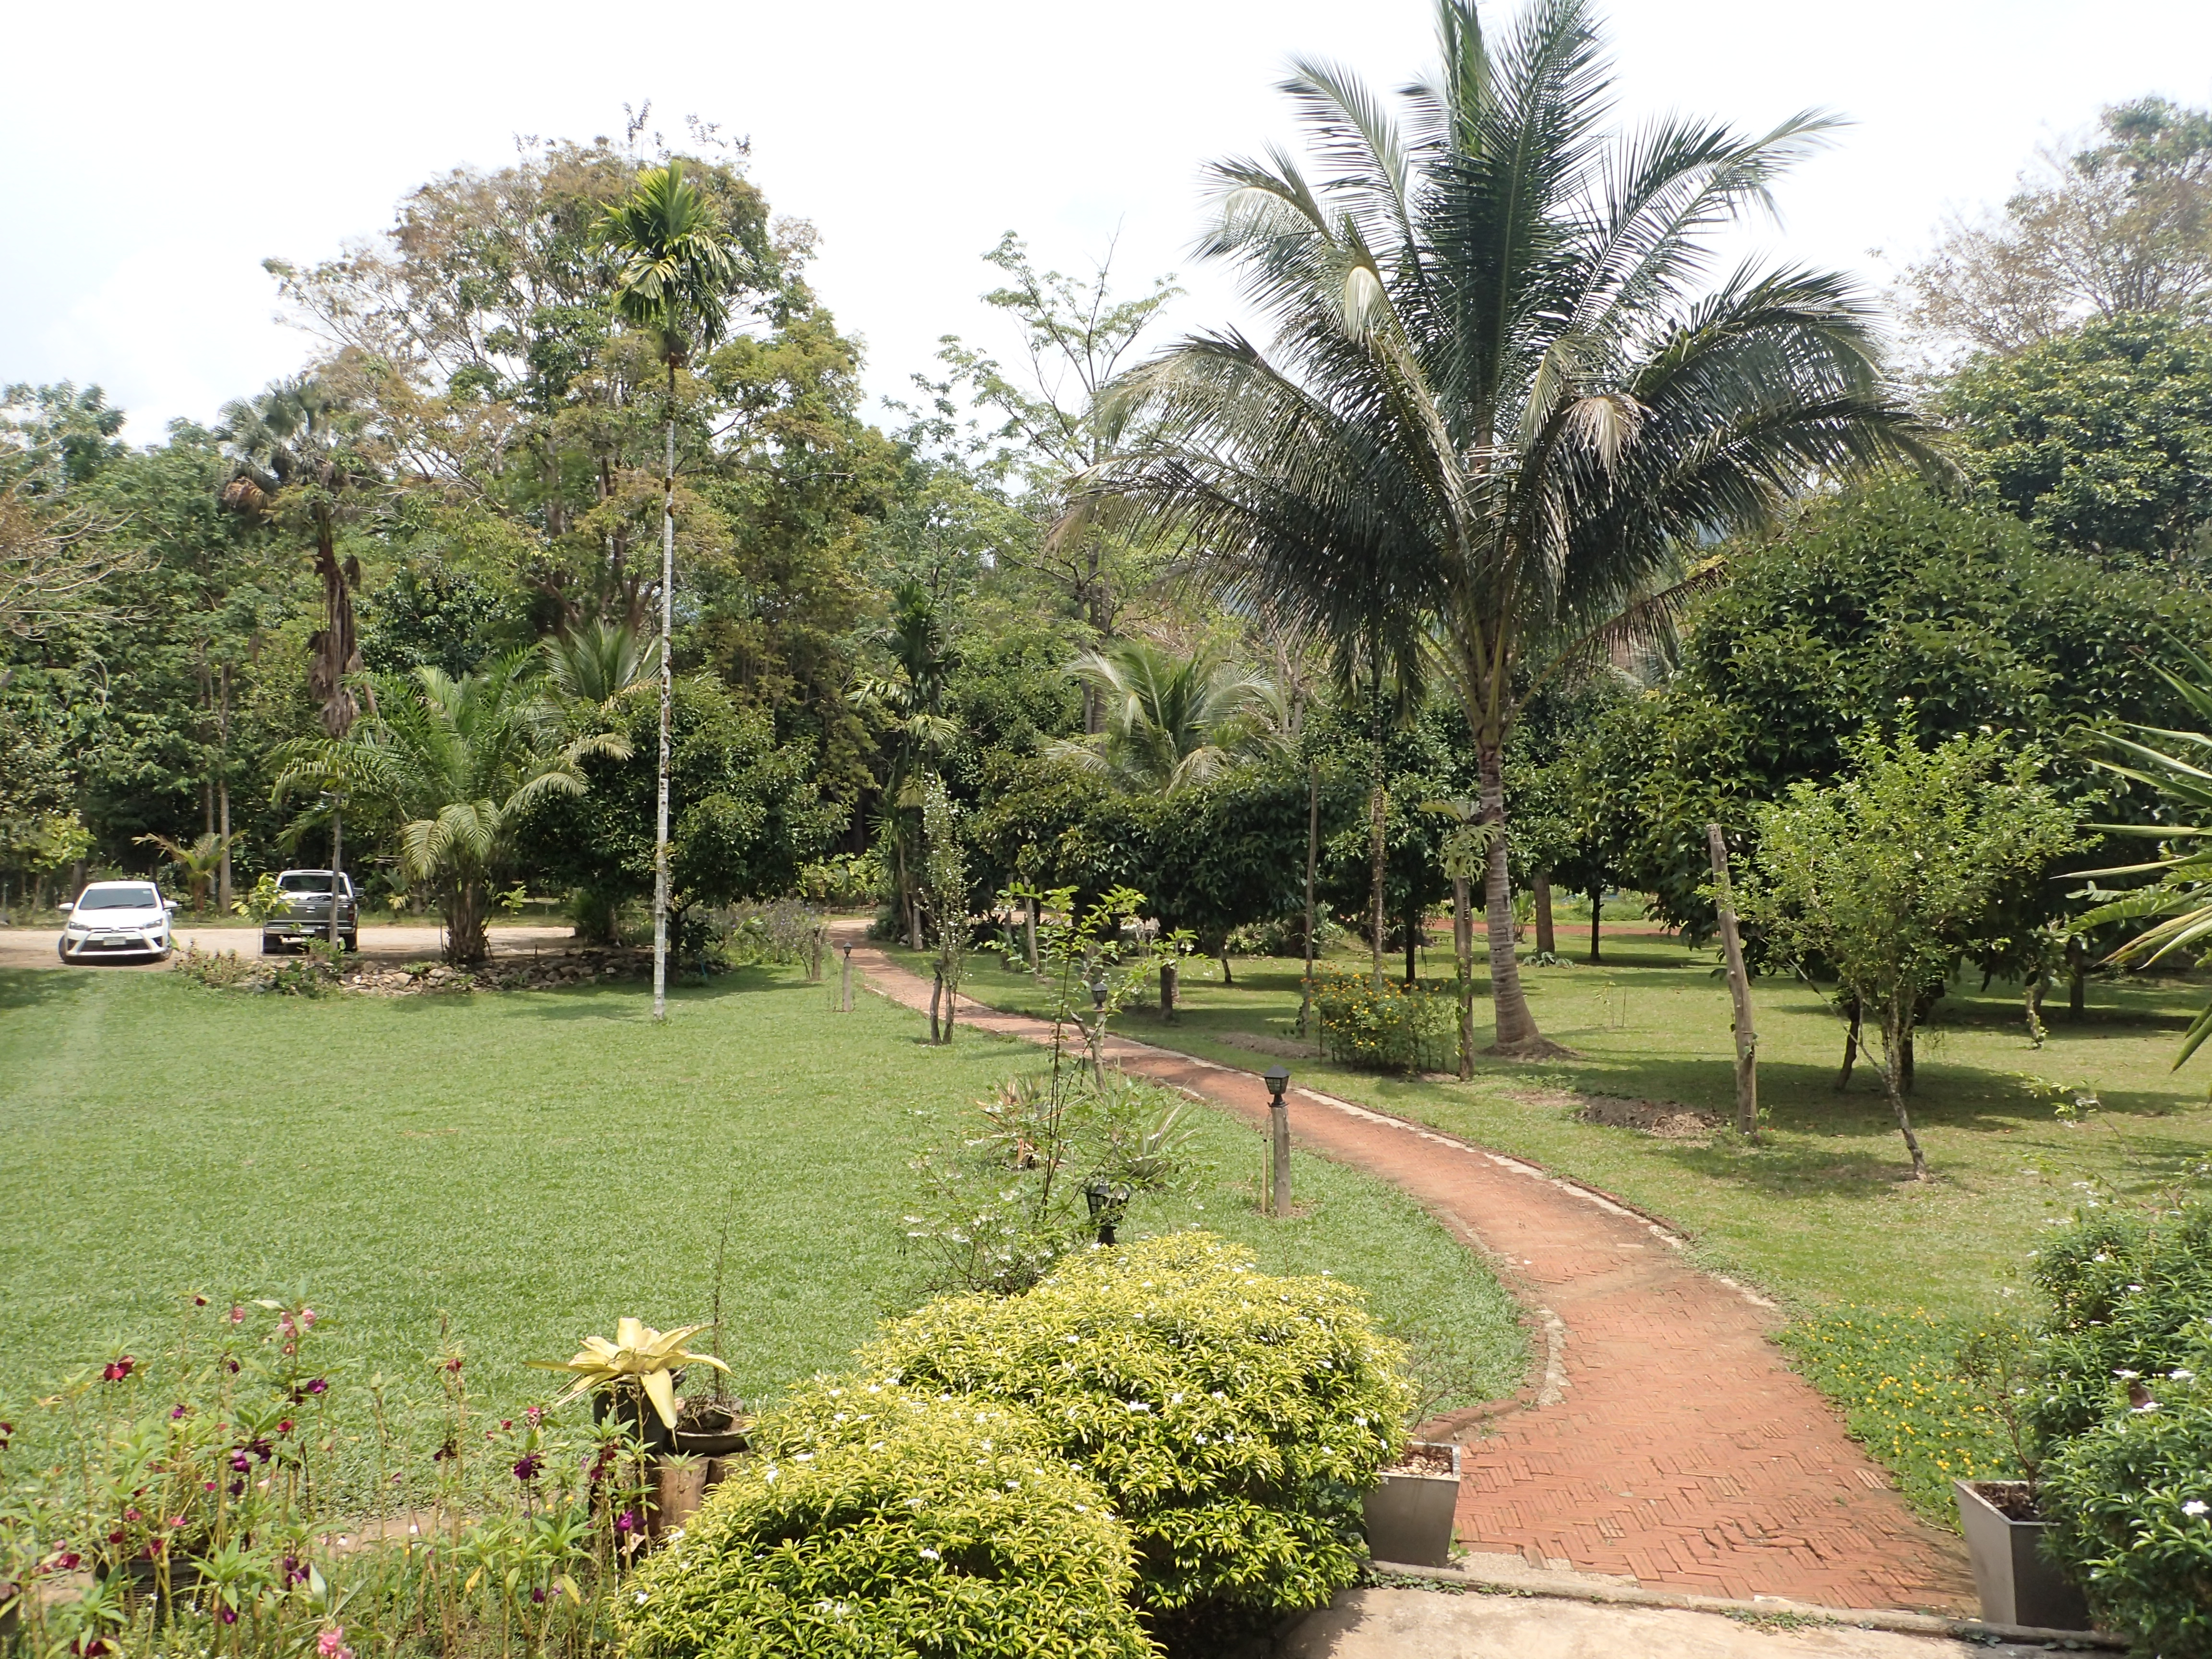 Rainforest Resort - Khao Sok National Park